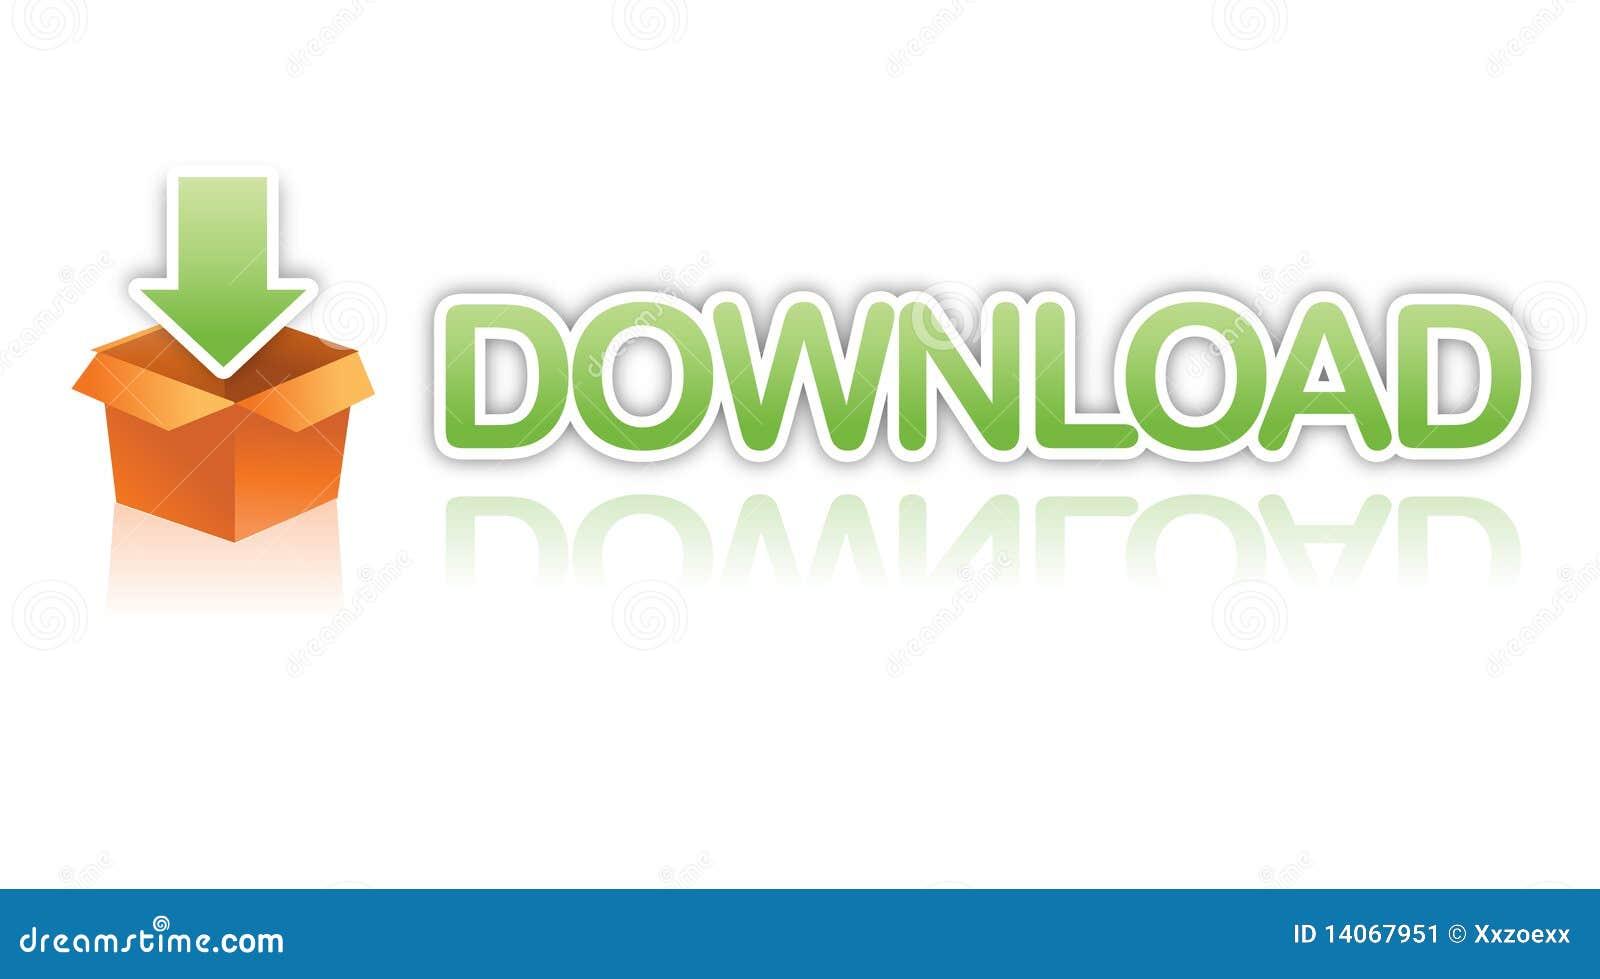 Best Website's For Online Business